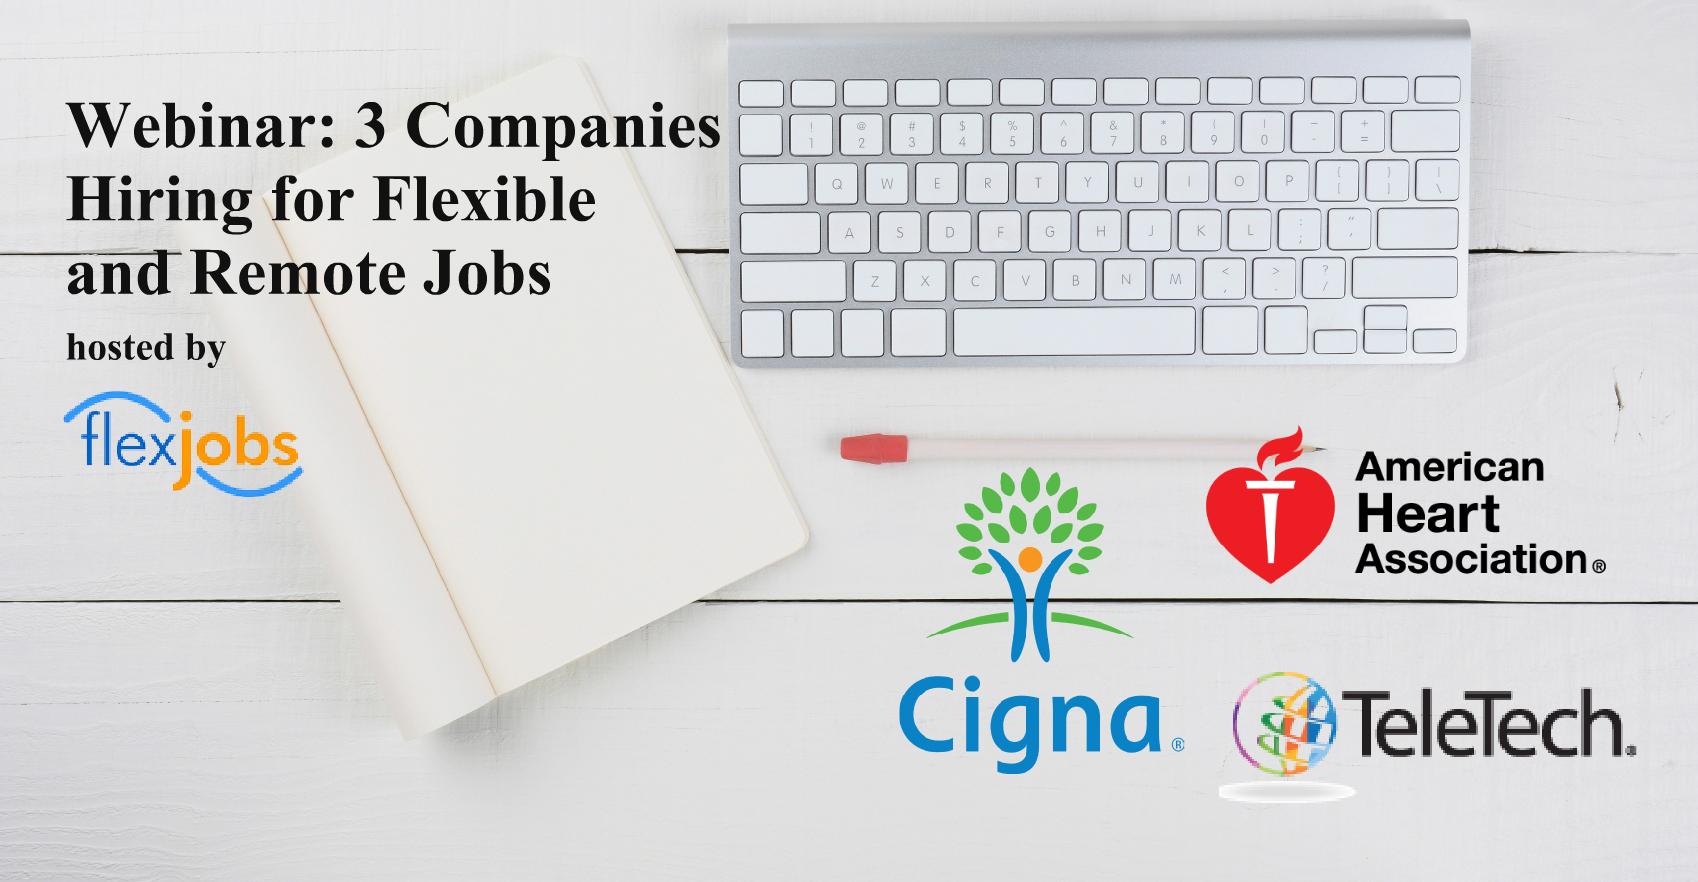 Webinar: 3 Companies Hiring for Flexible and Remote Jobs